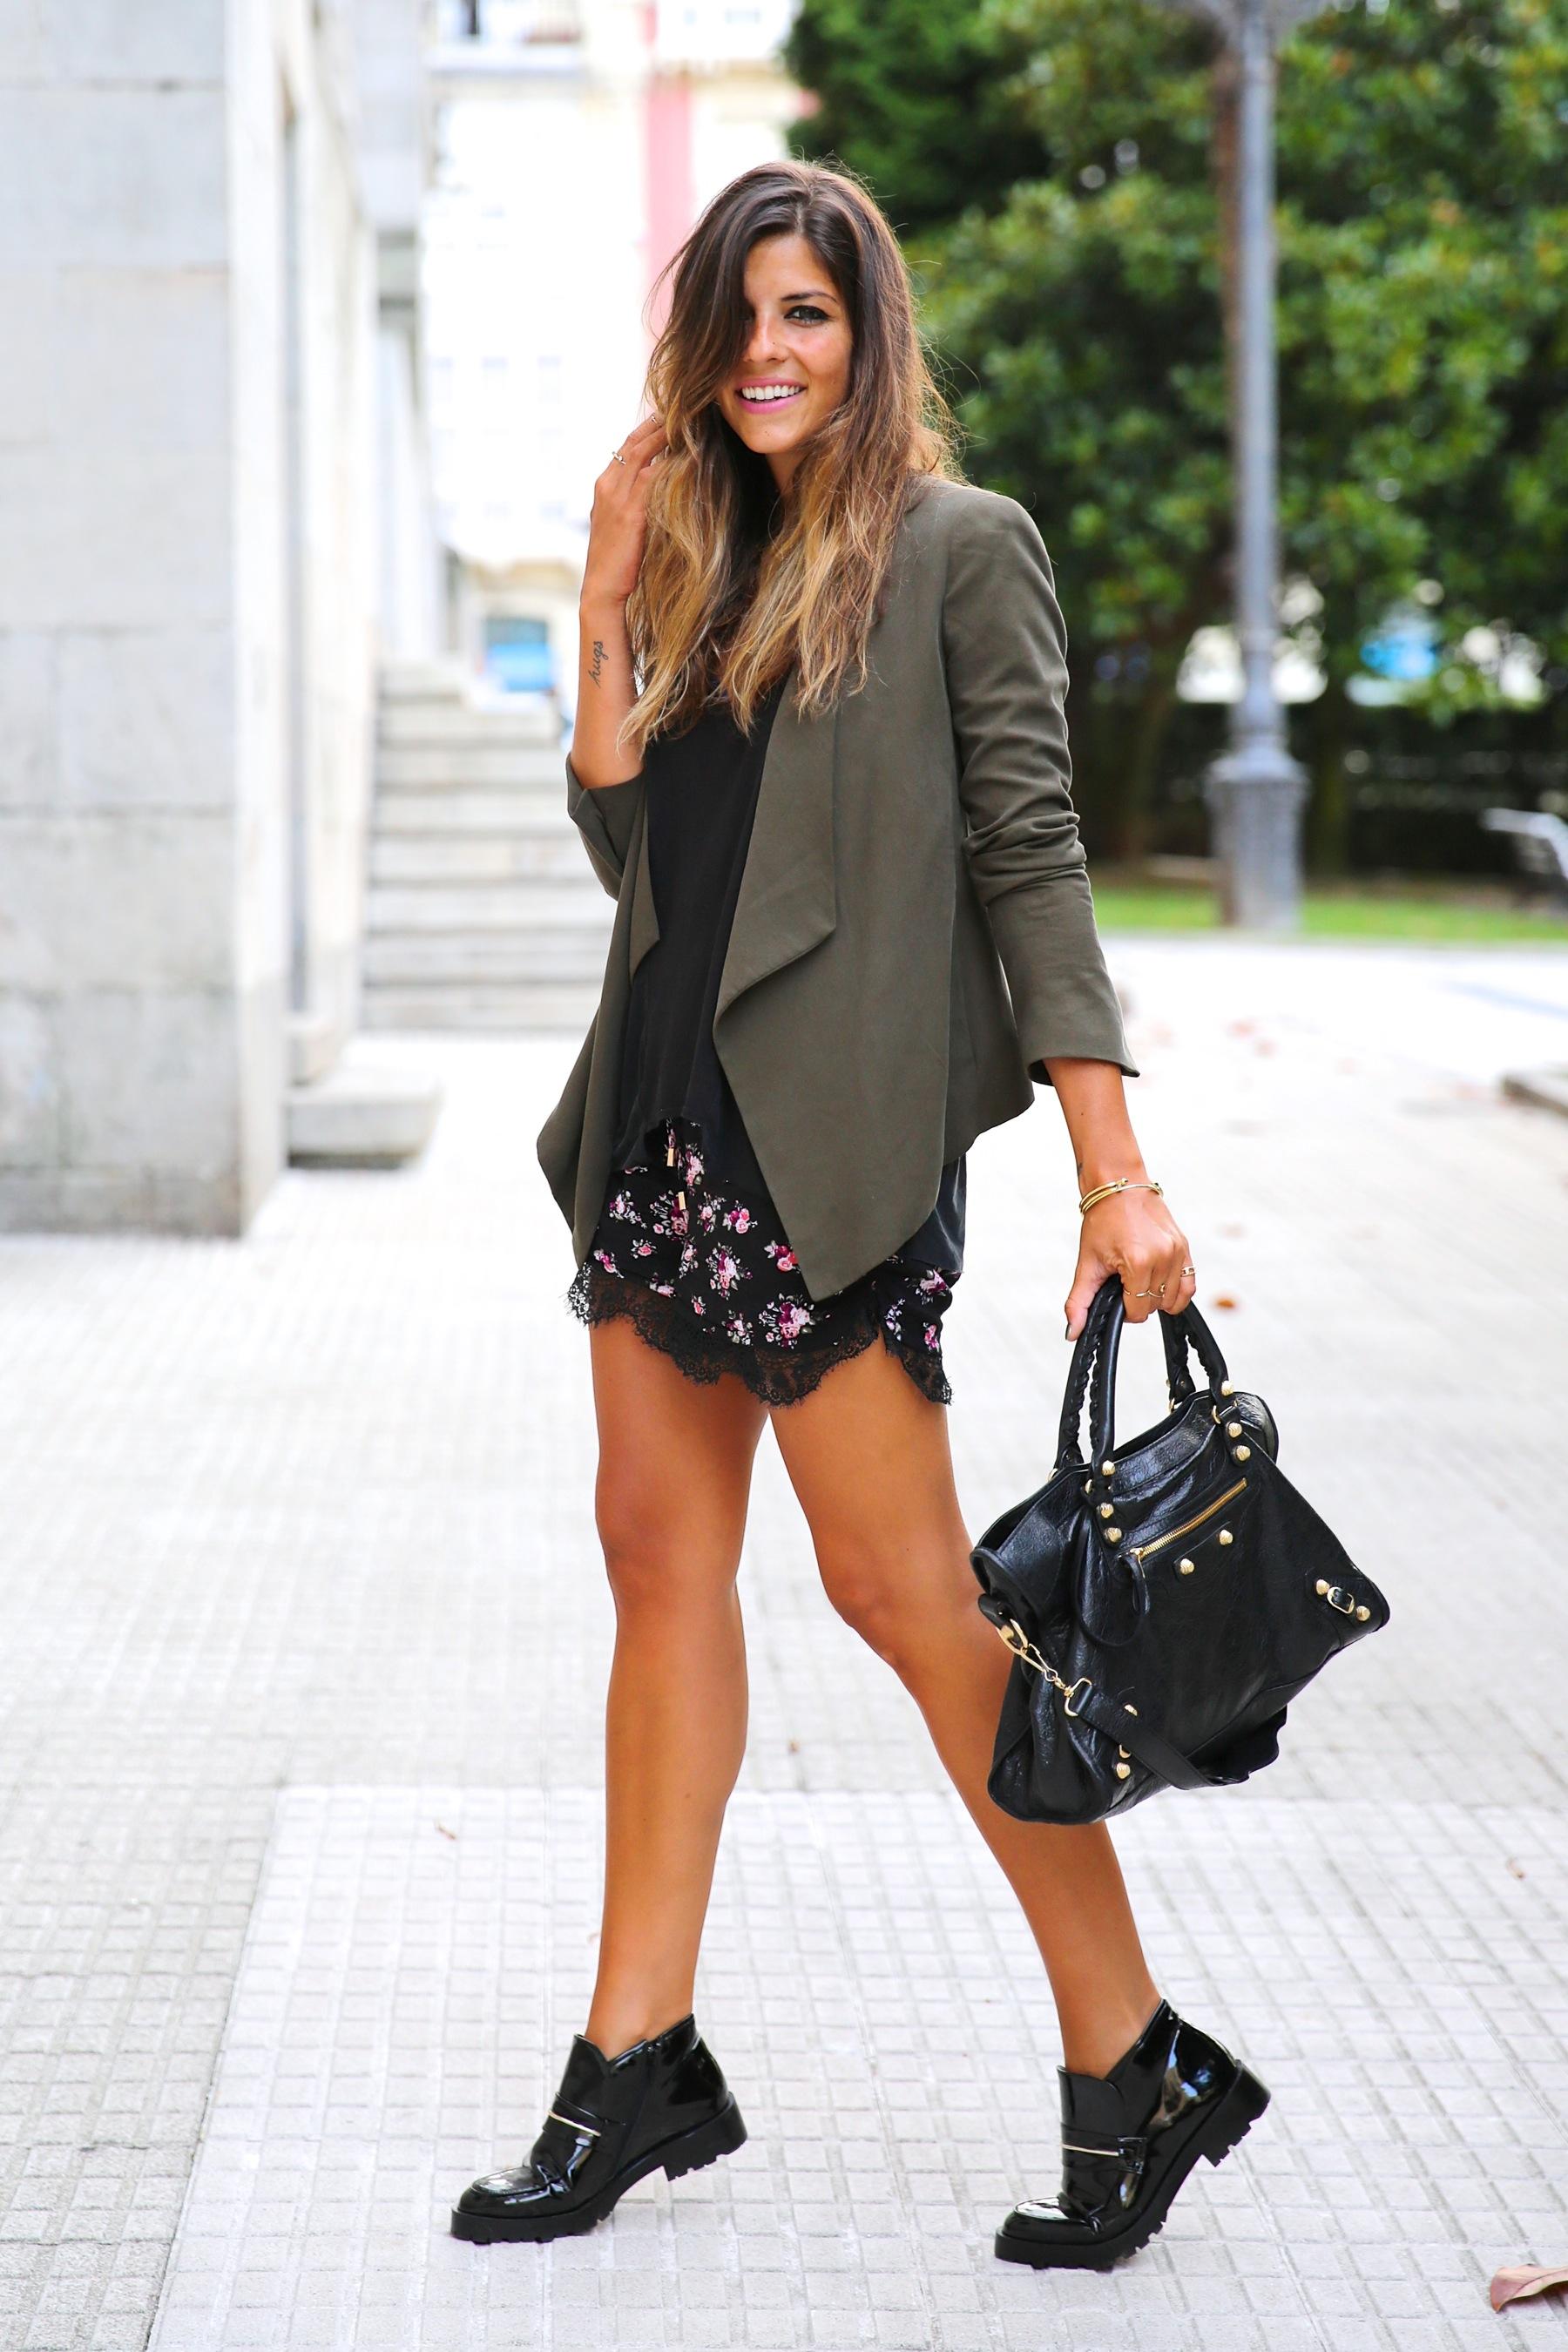 trendy_taste-look-outfit-street_style-ootd-blog-blogger-fashion_spain-moda_españa-khaki_blazer-blazer_caqui-flower_print-estampado_flores-shorts-botines_charol-9